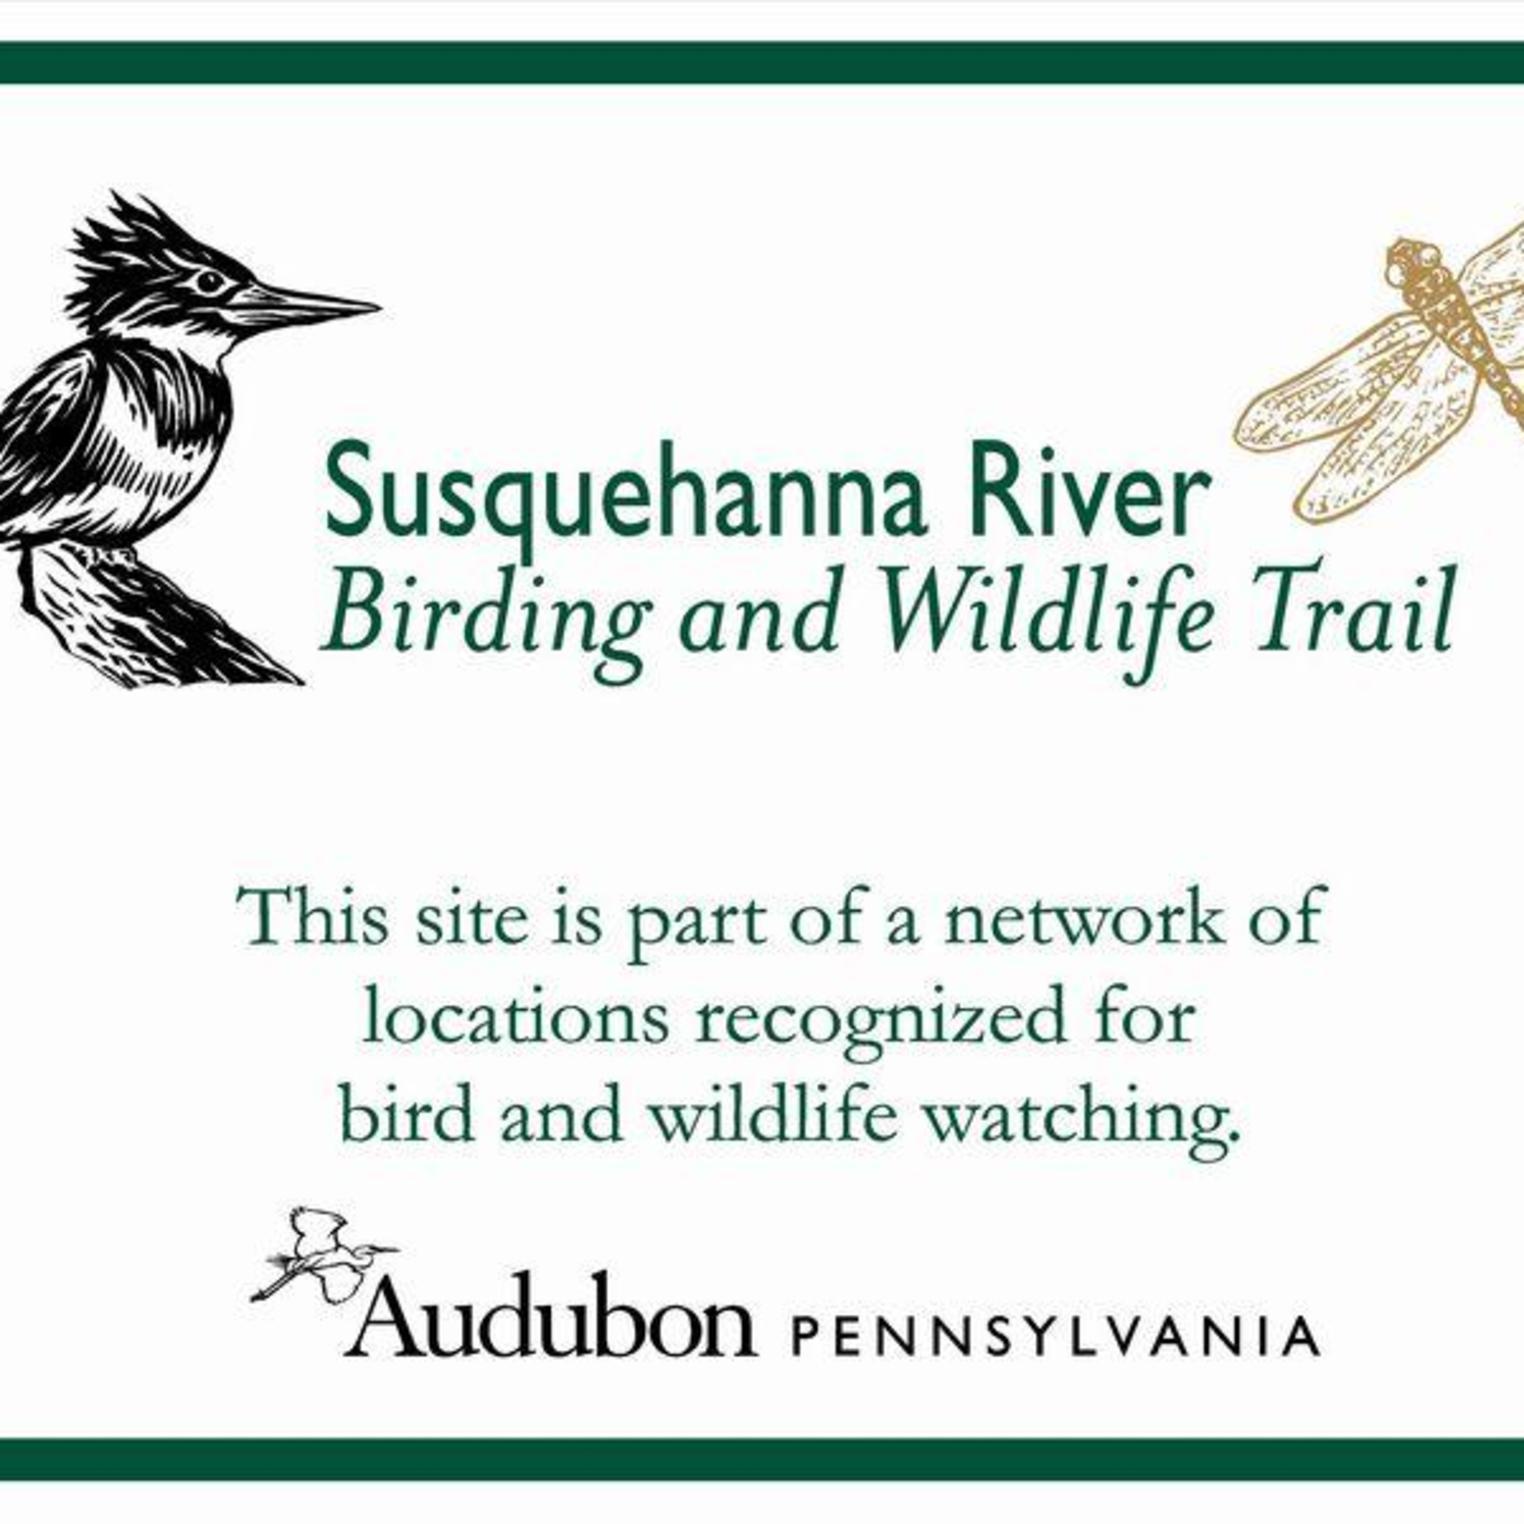 Susquehanna River Birding and Wildlife Trail